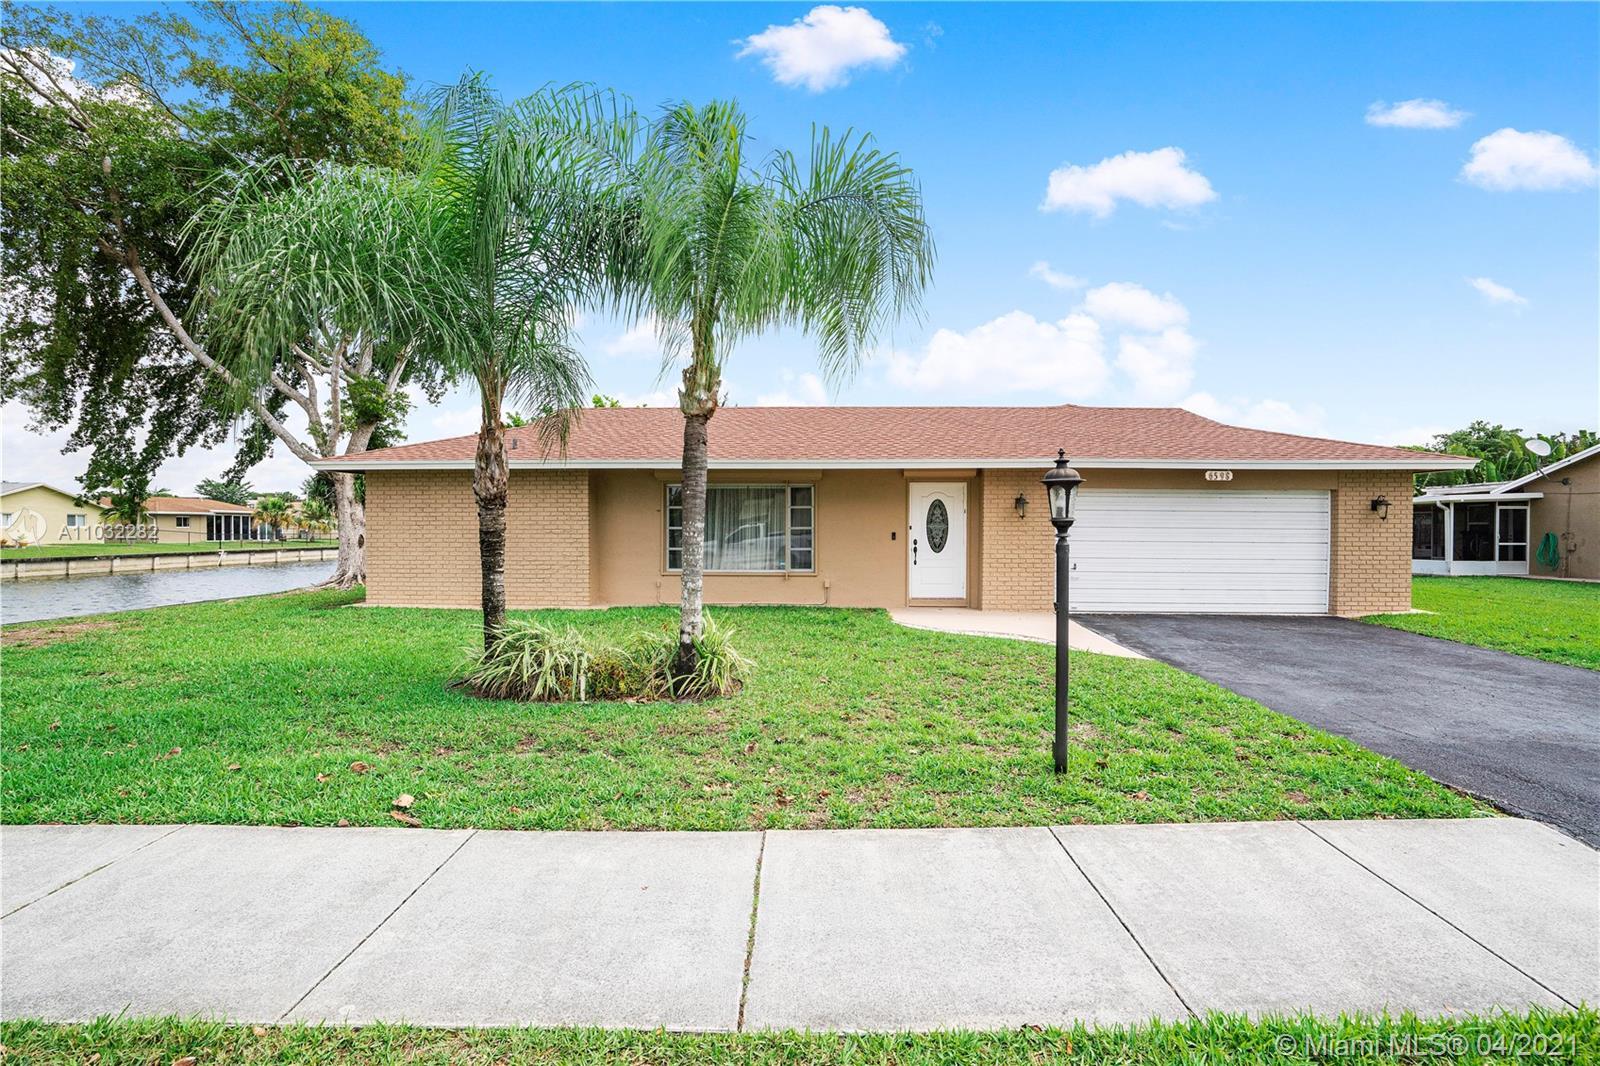 Property for sale at 6598 Westwood Blvd W, Tamarac,  Florida 33321